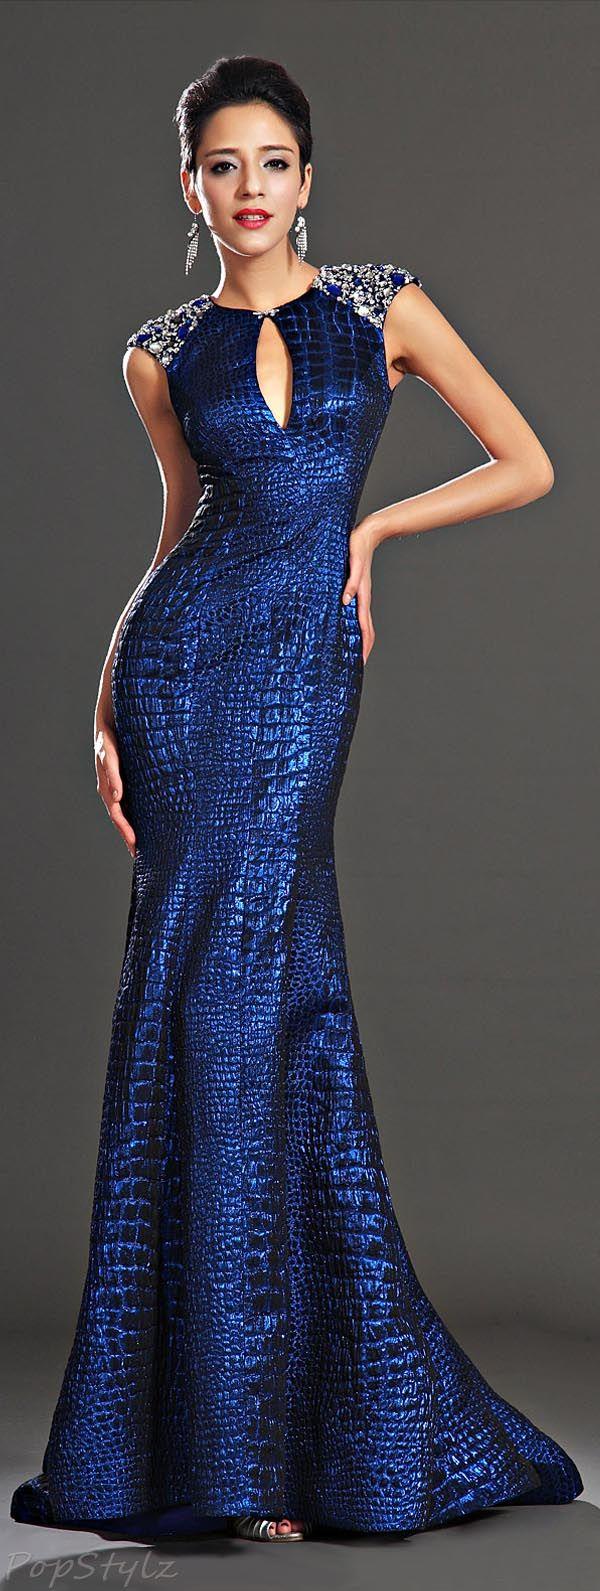 Blue evening dress dresses pinterest blue evening dresses